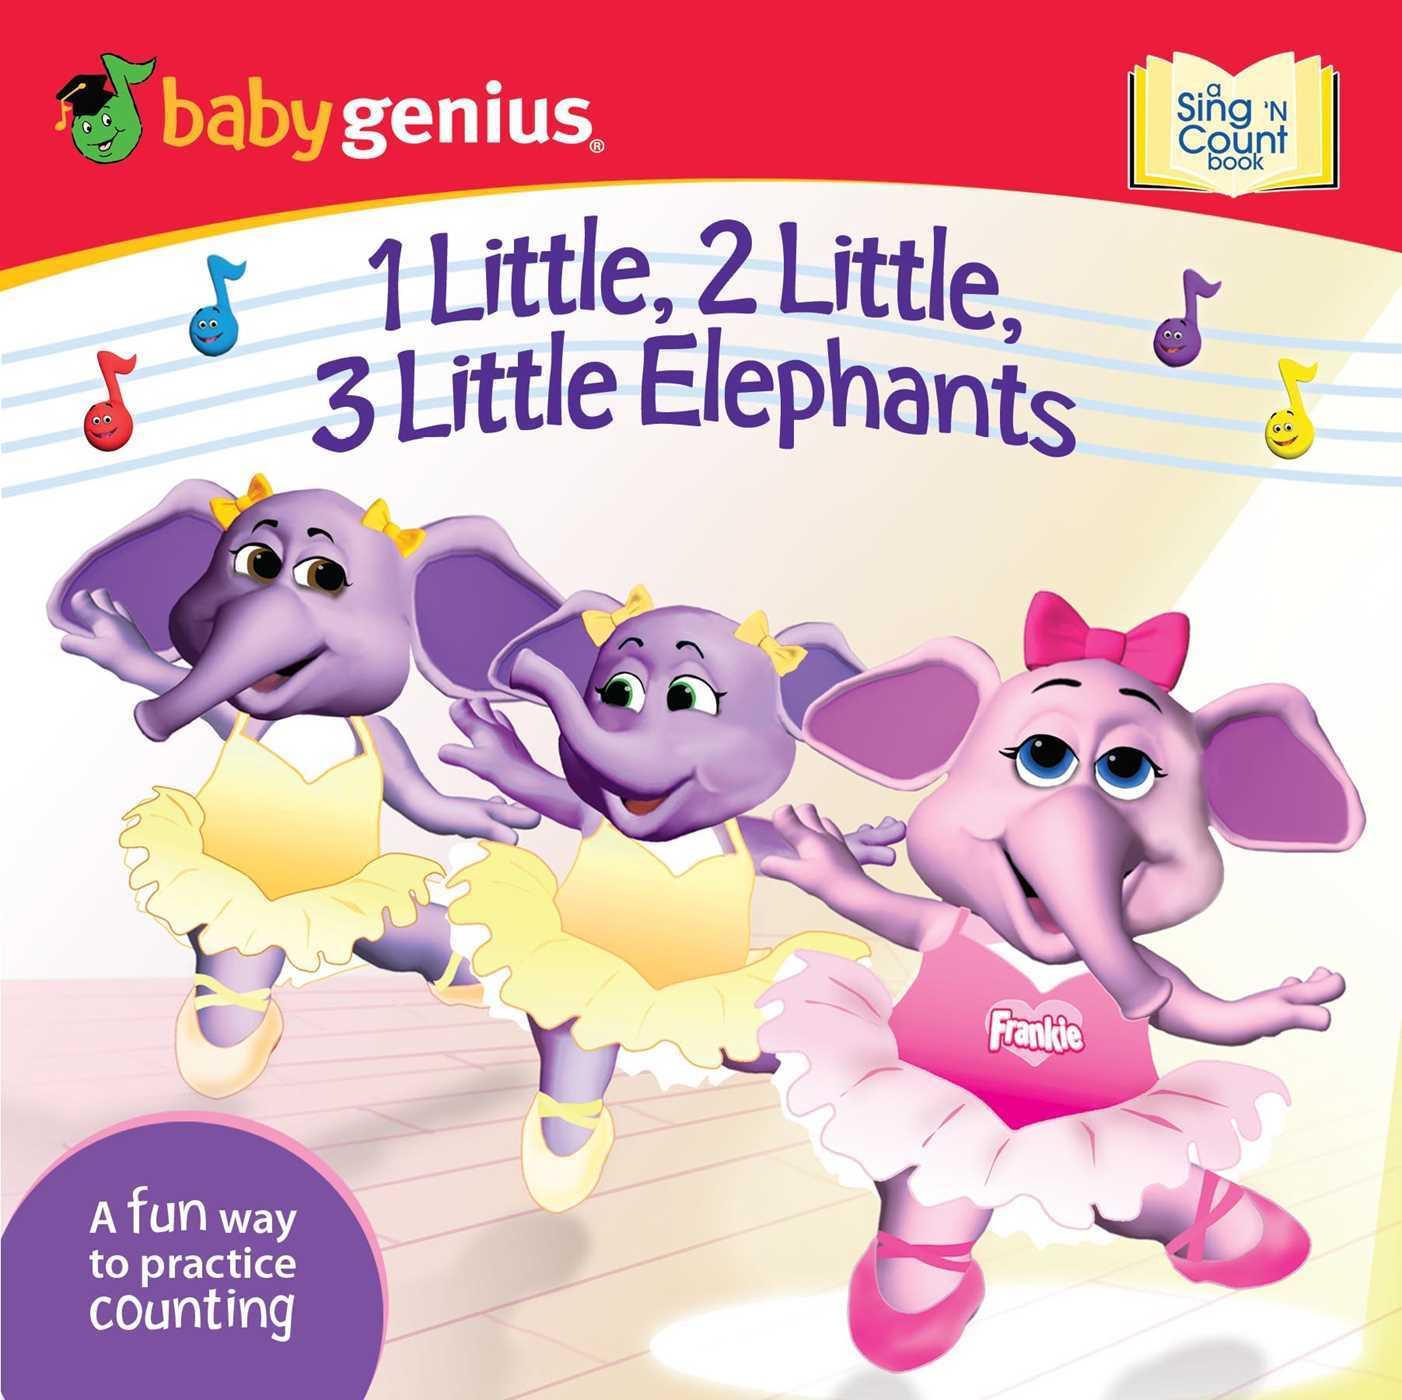 1 Little, 2 Little, 3 Little Elephants: A Sing 'n Count Book